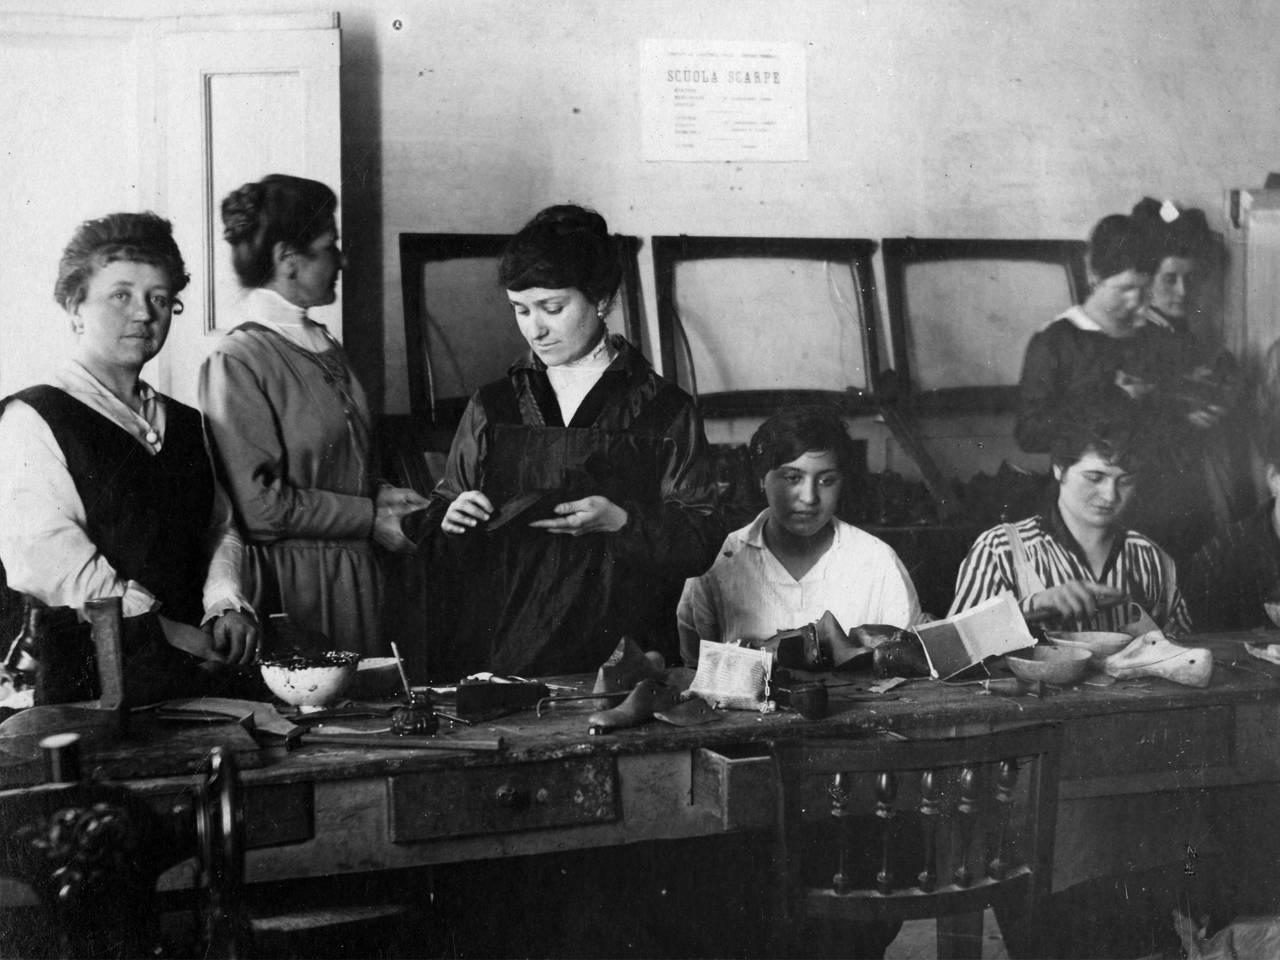 CALZOLAIE DEL COMITATO CIVILE IN VIA San Pietro MARTIRE FOTOTECA BIBLIOTECA PANIZZI, FOTO ROBERTO SEVARDI - REGGIO EMILIA 1917